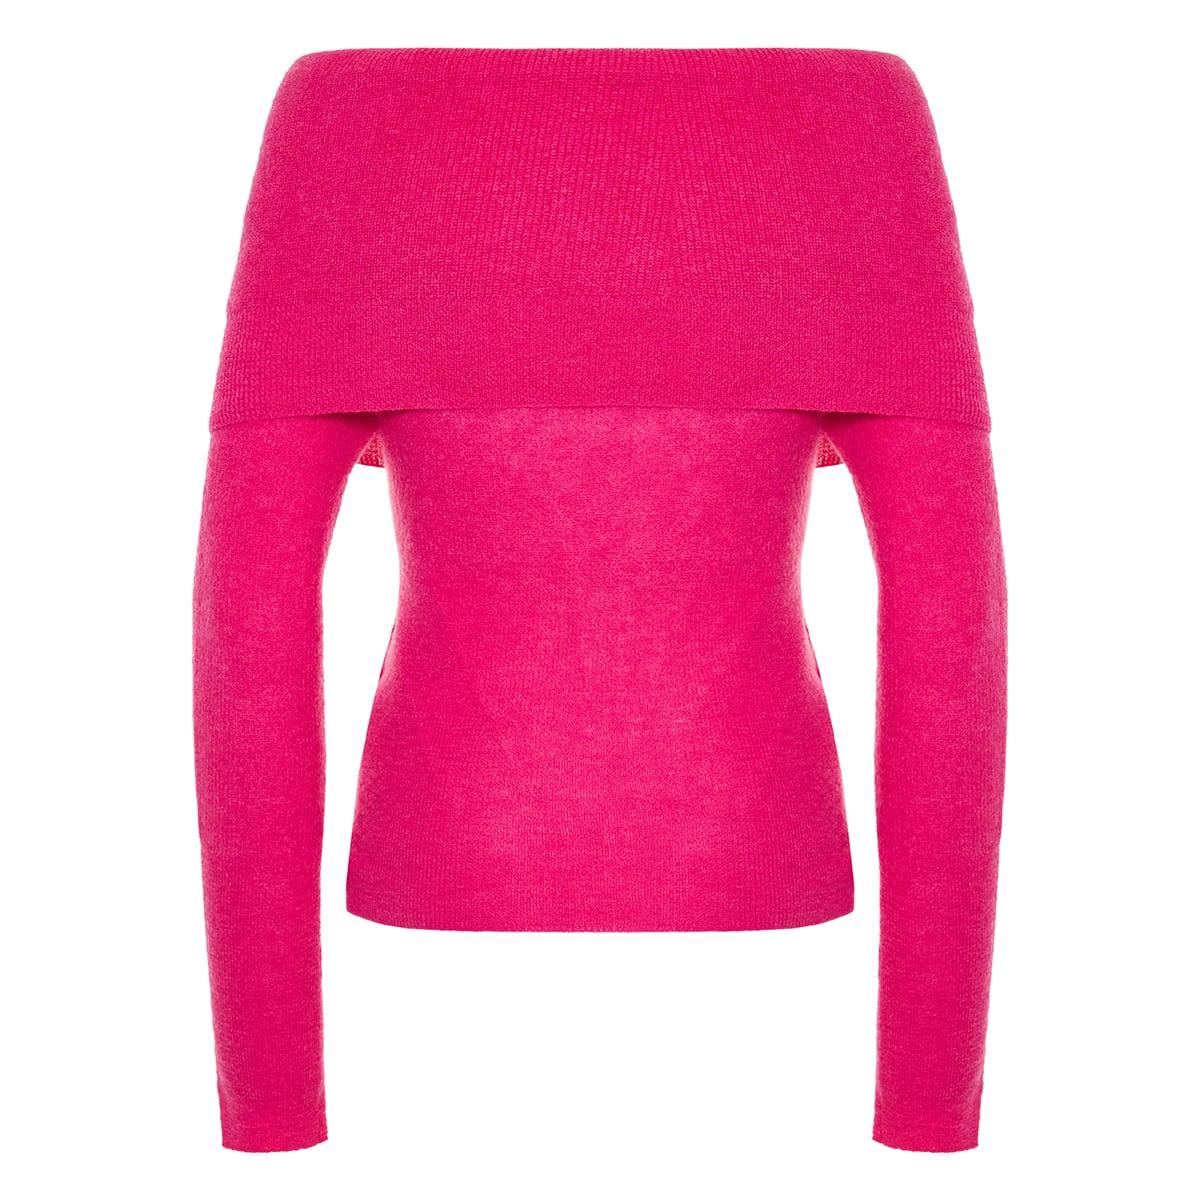 La Maille Ascua off-the-shoulder sweater